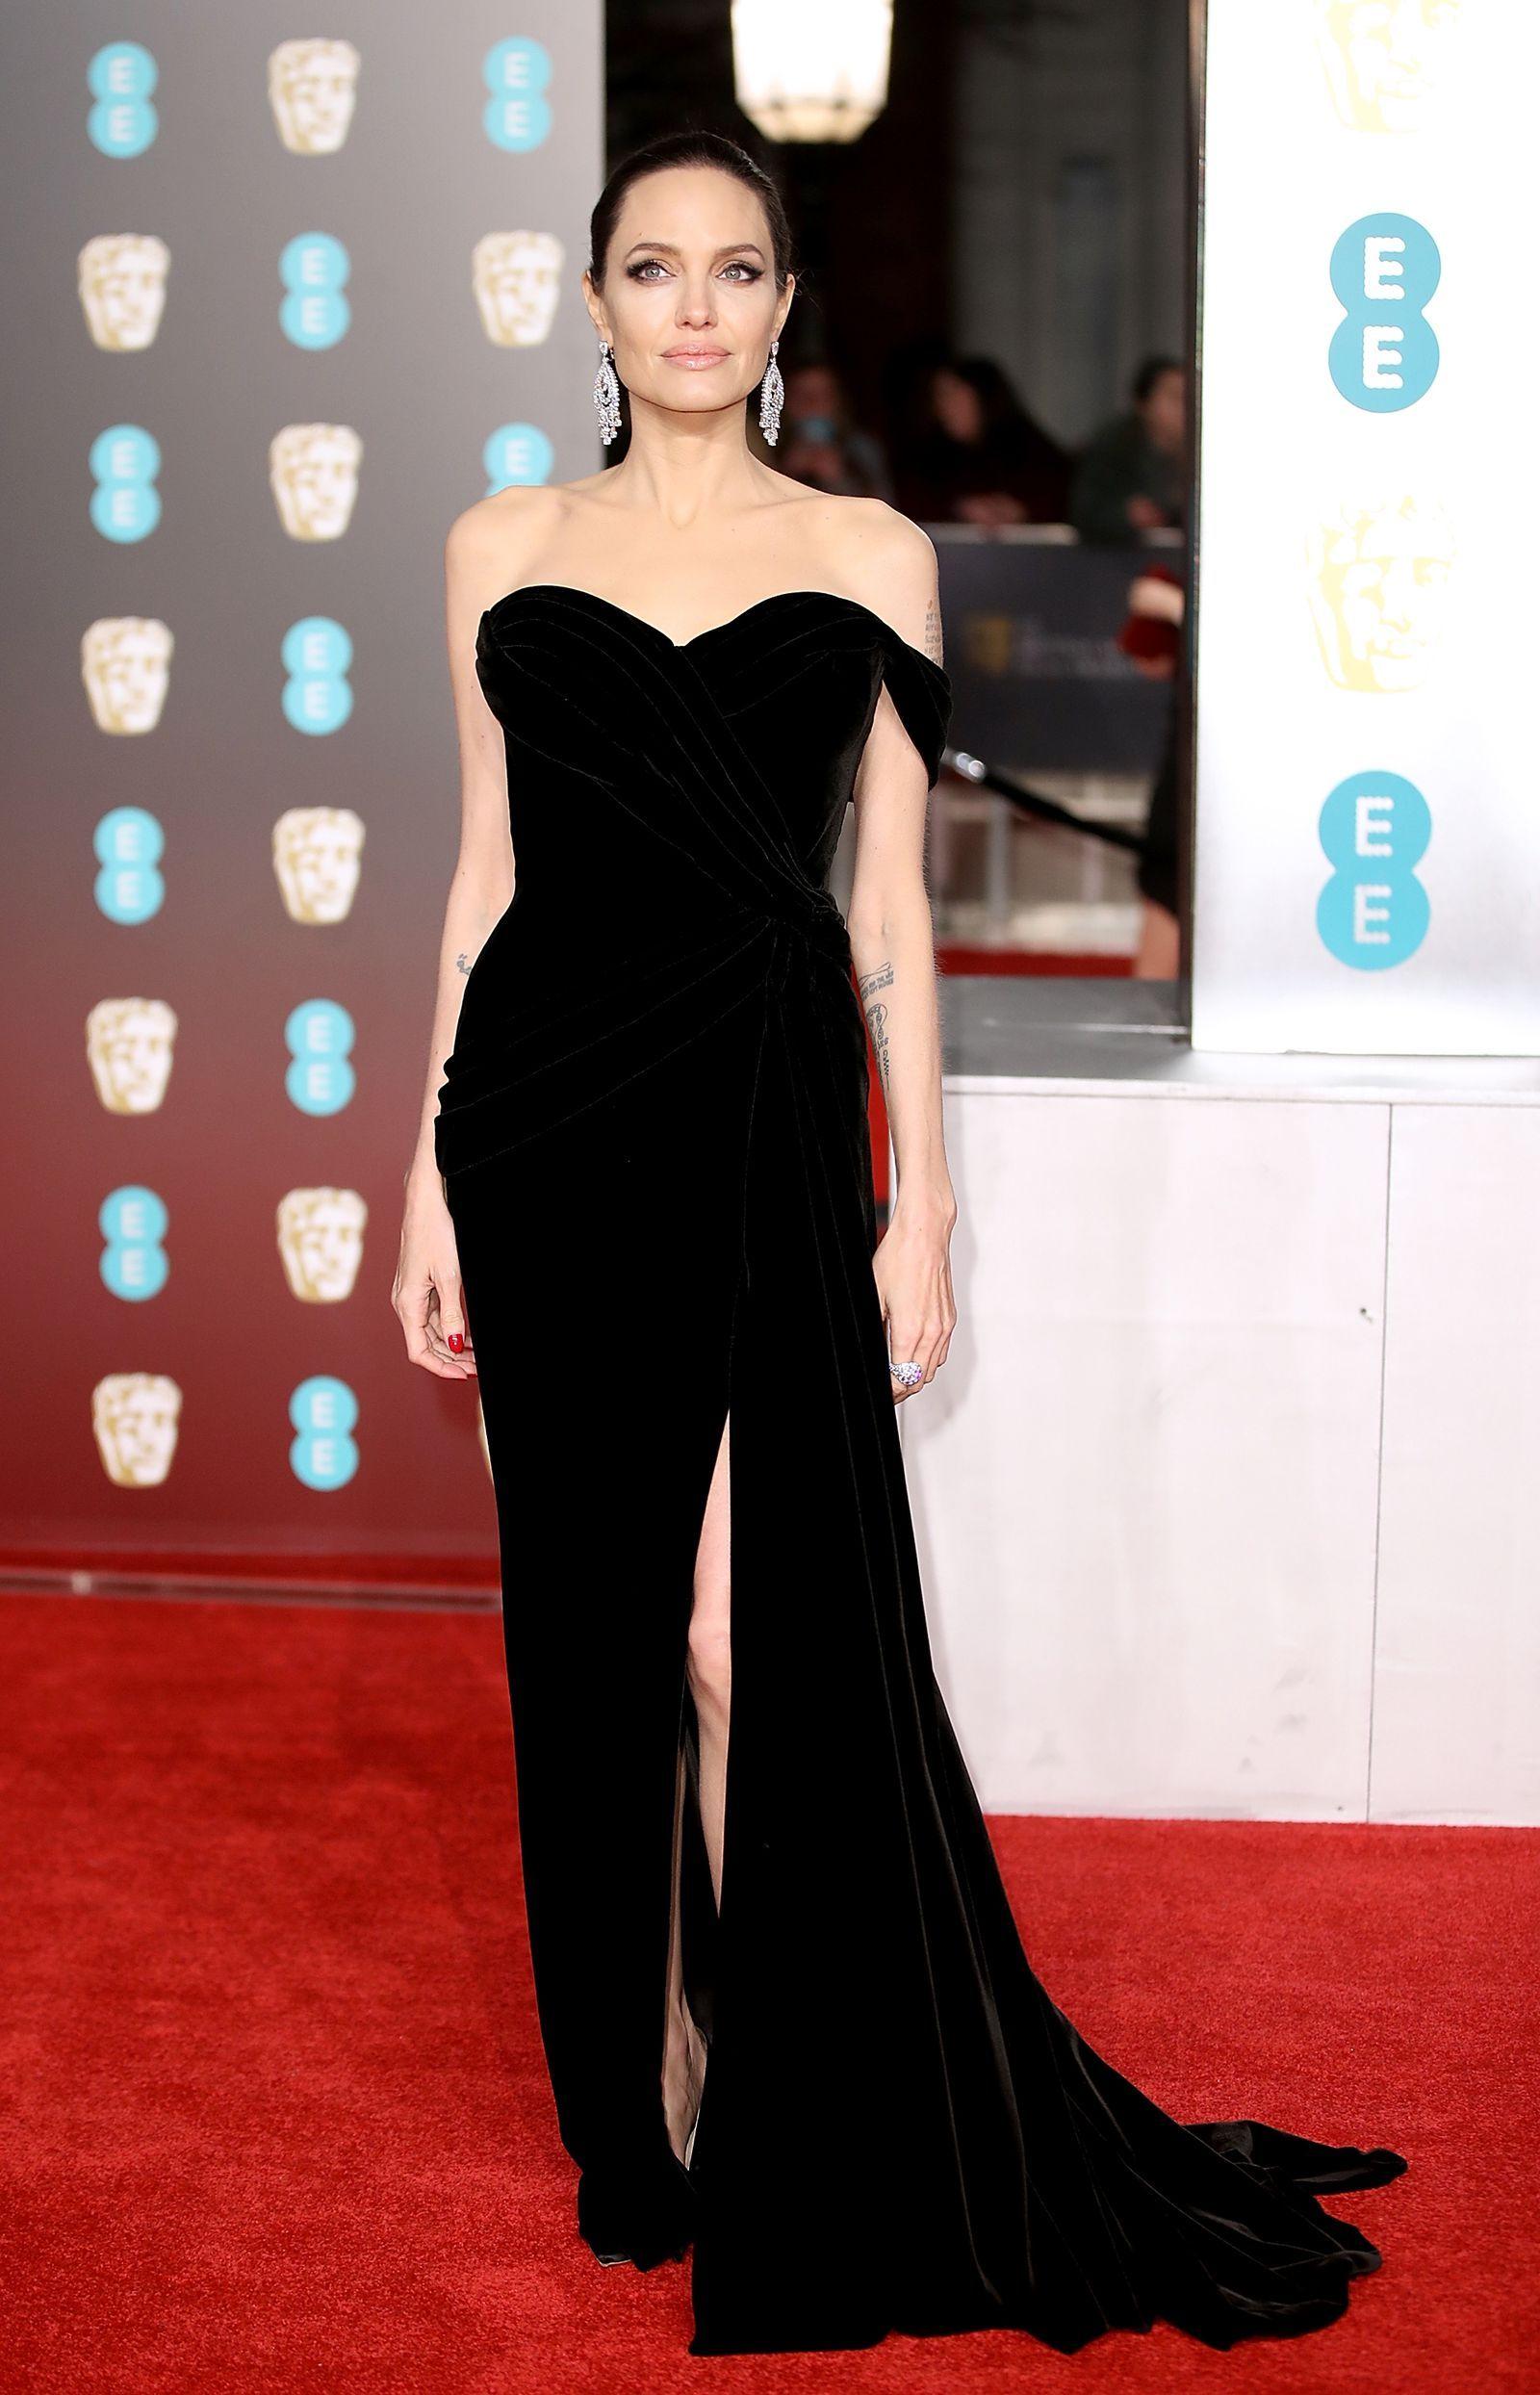 Angelina Jolie Film Nuda the best of the bafta awards 2018 red carpet fashion | black